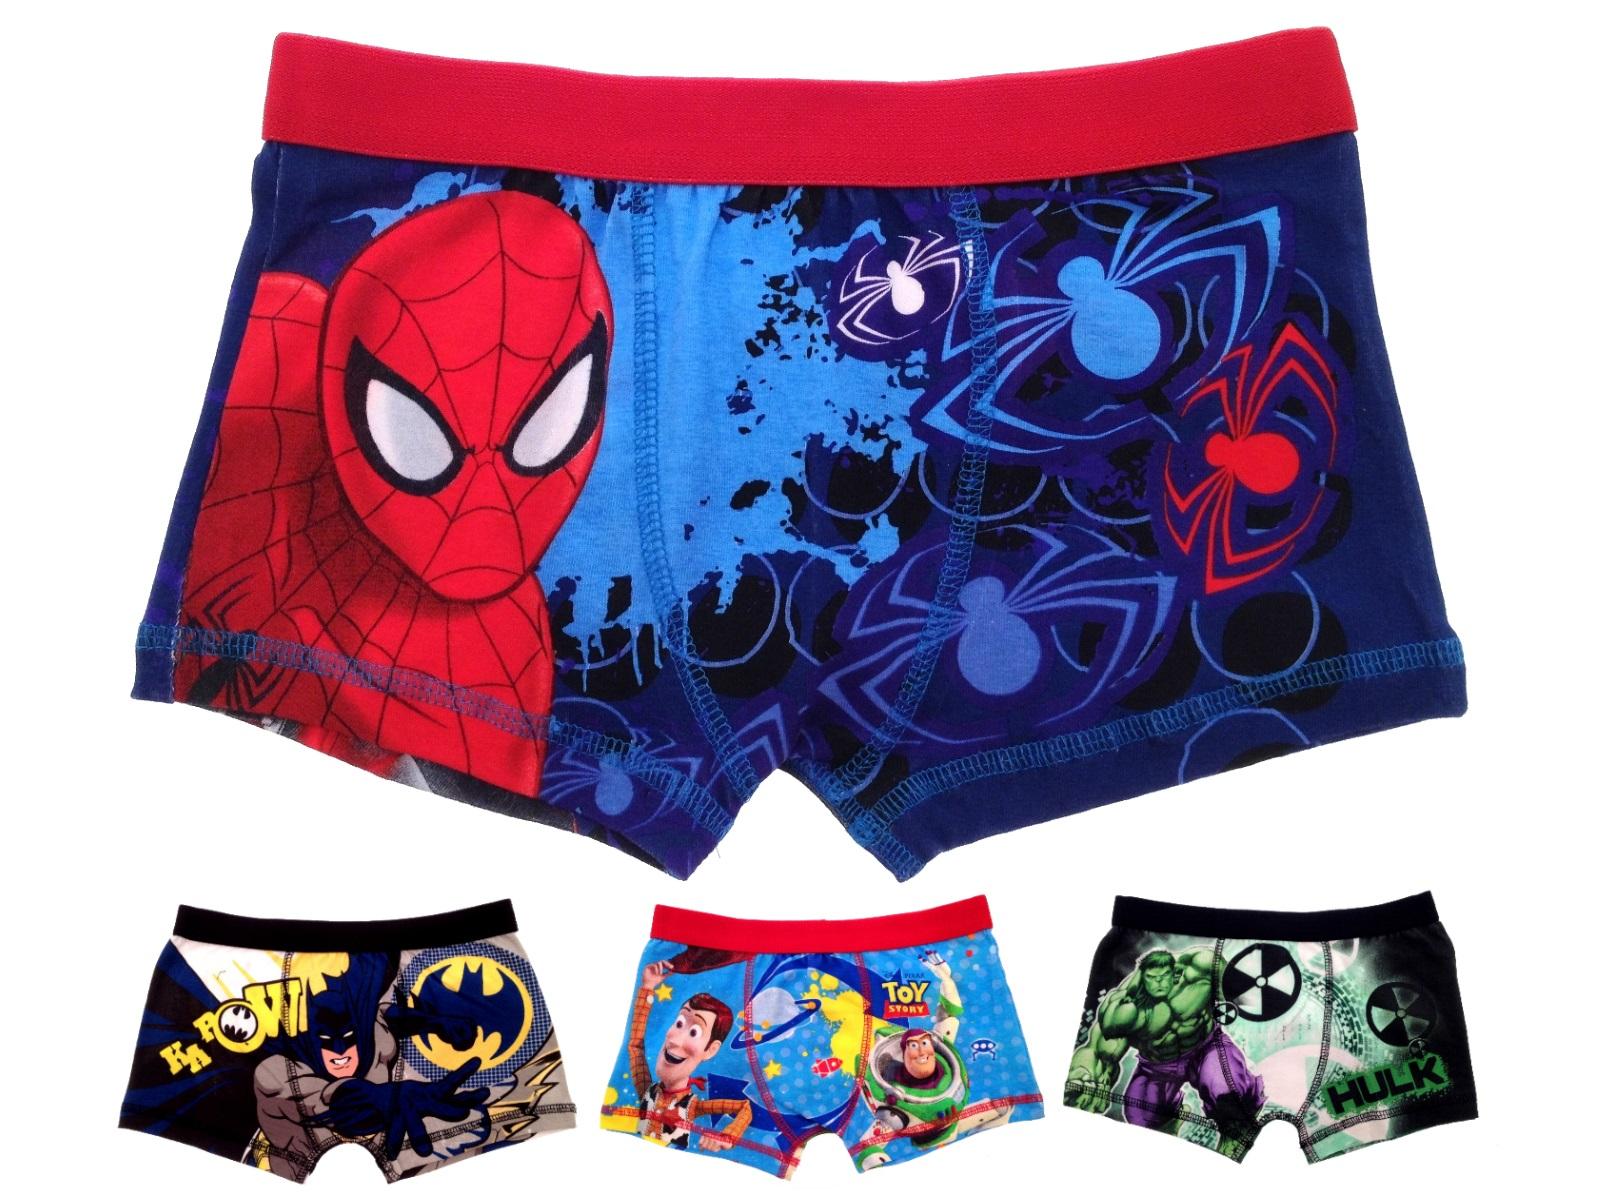 Ni os chicos car cter oficial boxer shorts ropa interior for Ropa interior para ninos